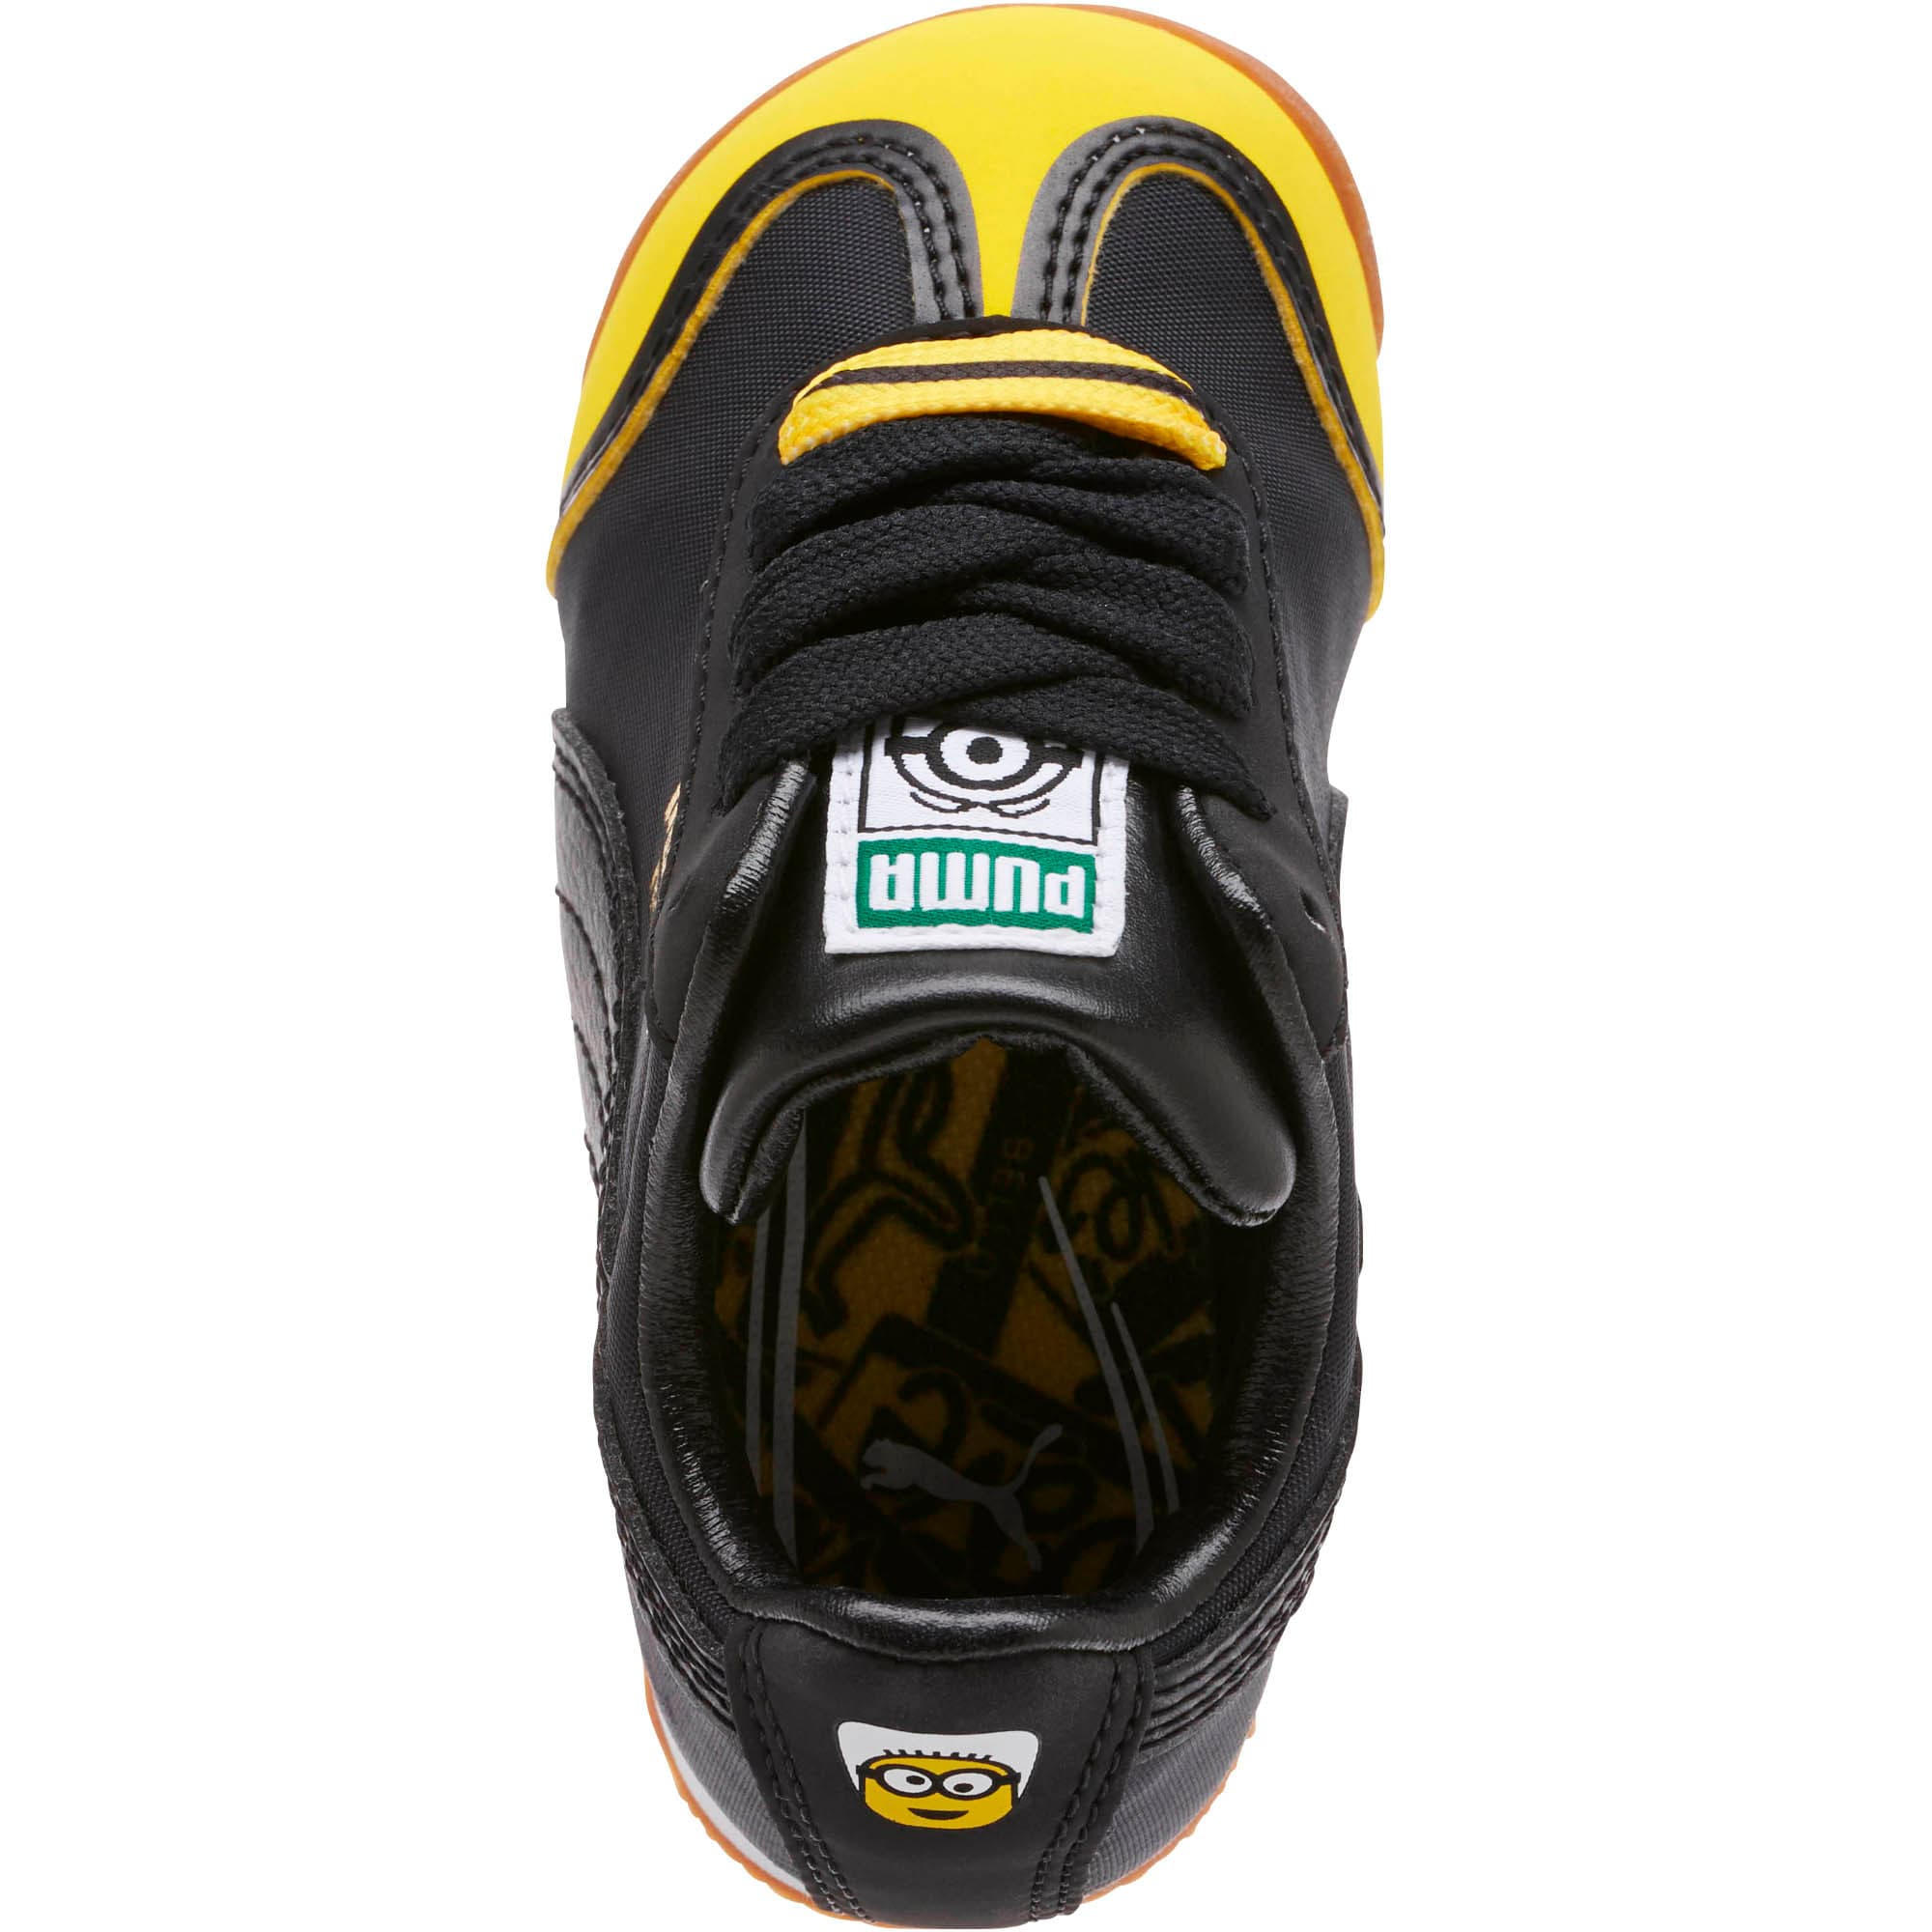 Thumbnail 5 of Minions Roma Toddler Shoes, Black-Minion Yellow-Black, medium